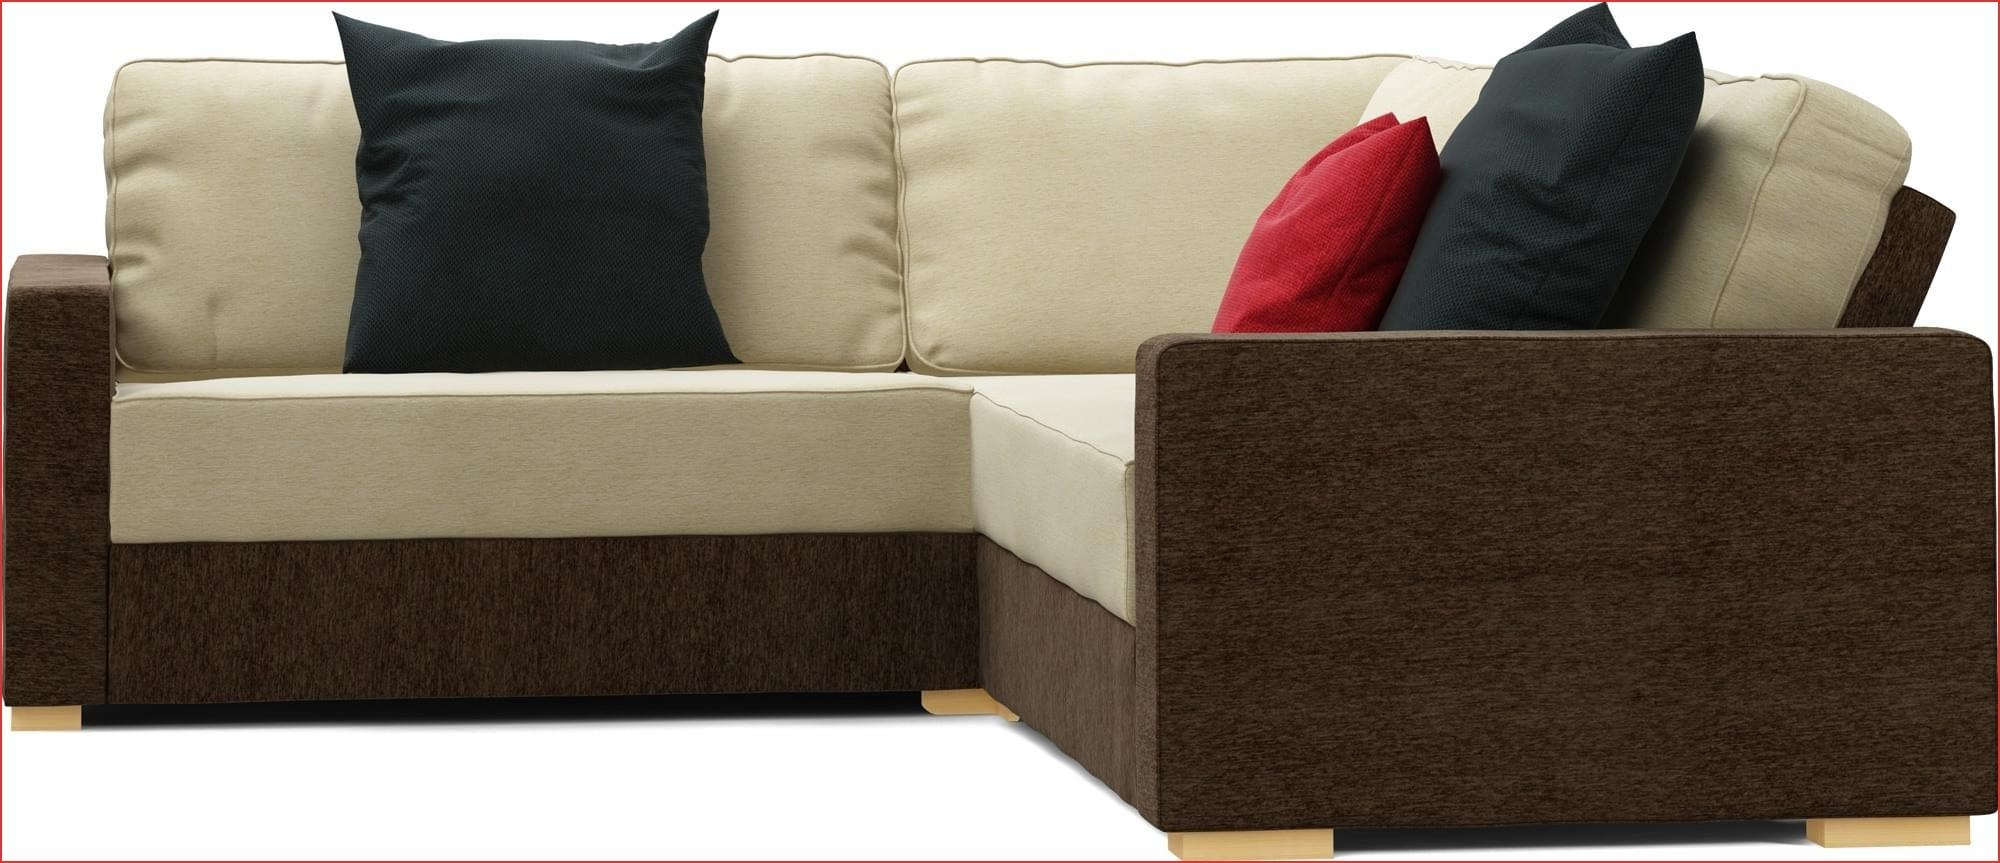 Incredible Custom Made Corner Sofa - Inspirational Interior style ...